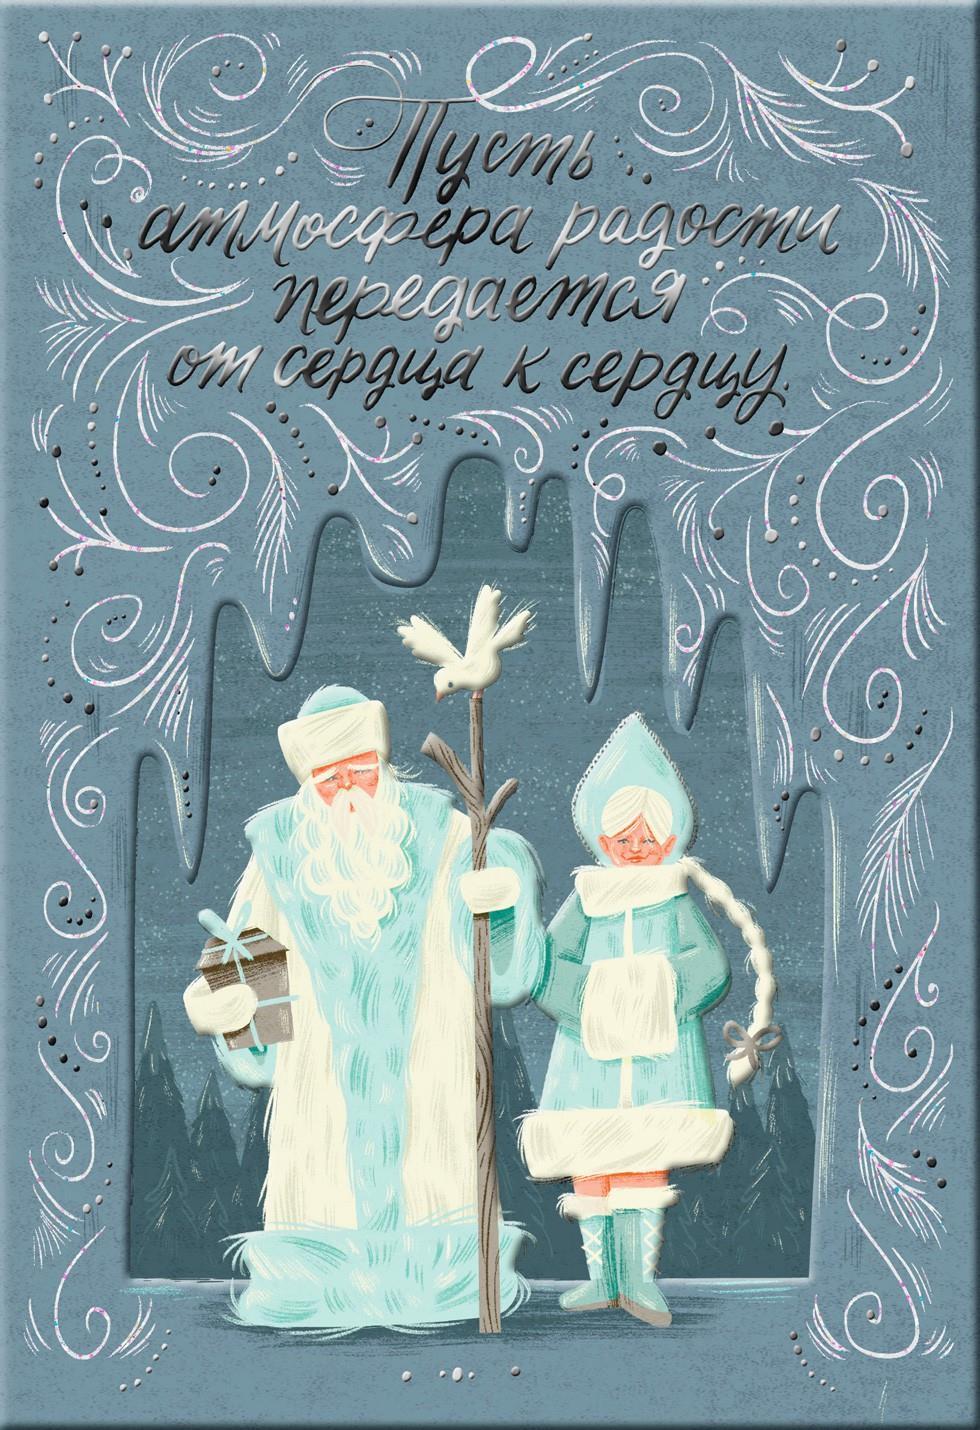 Heritage Santa Claus Russian-Language Christmas Card ...